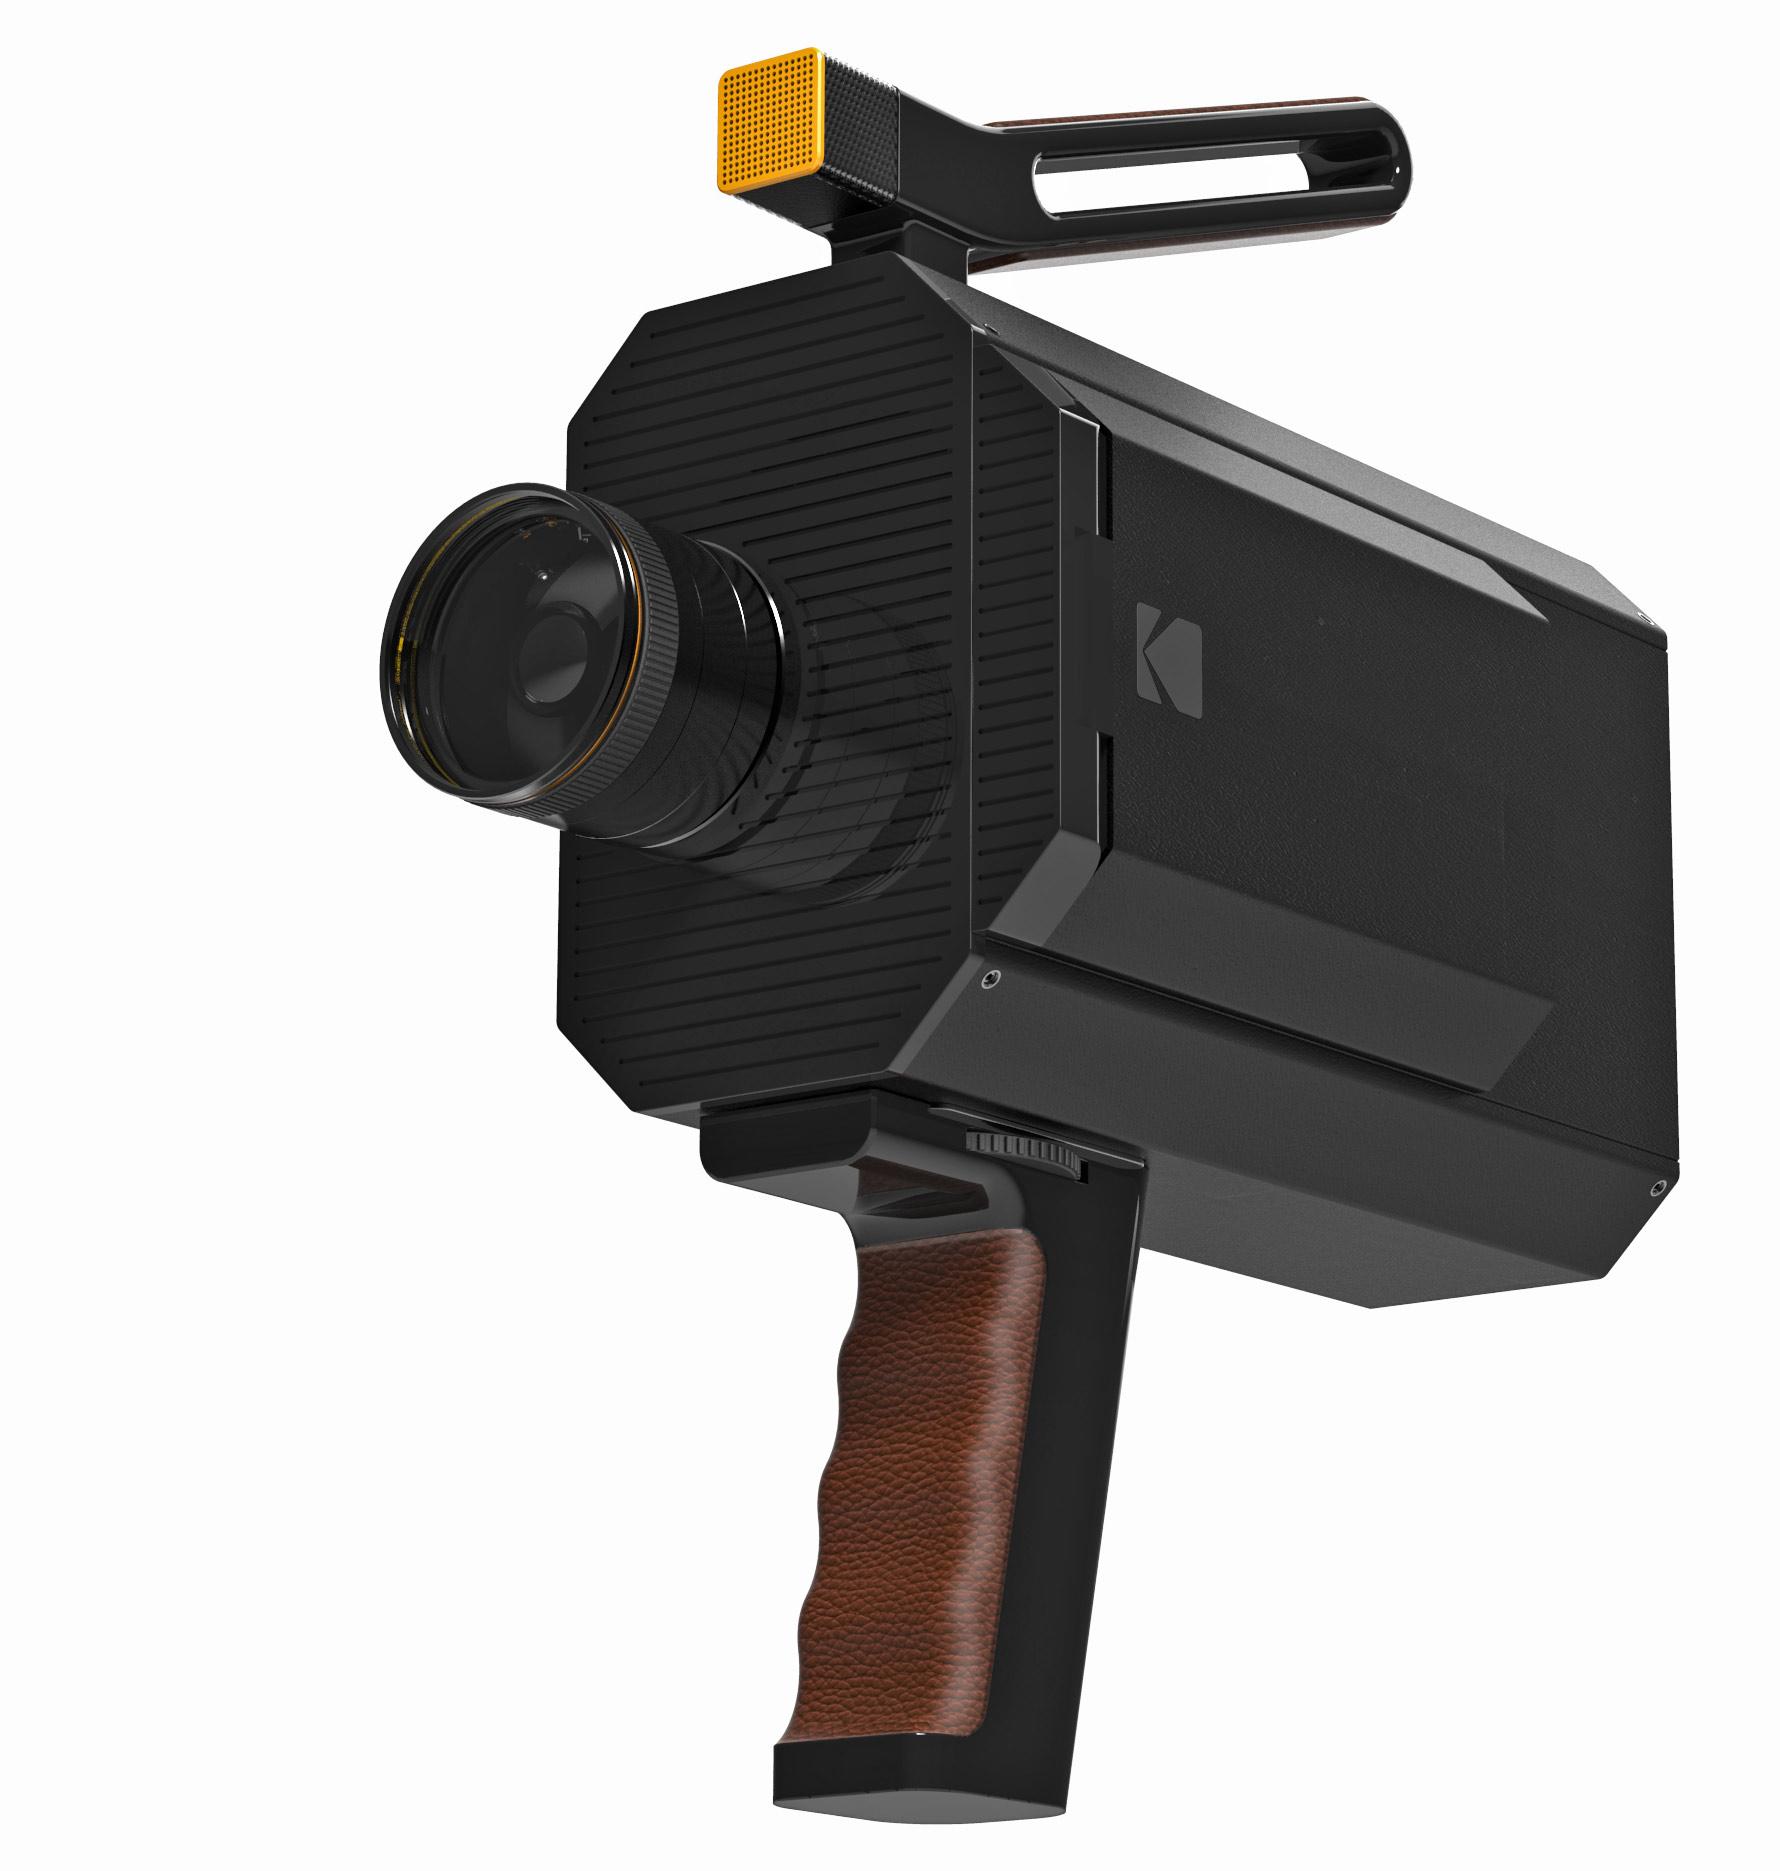 B_0116_Kodak_S8_11_Pistol